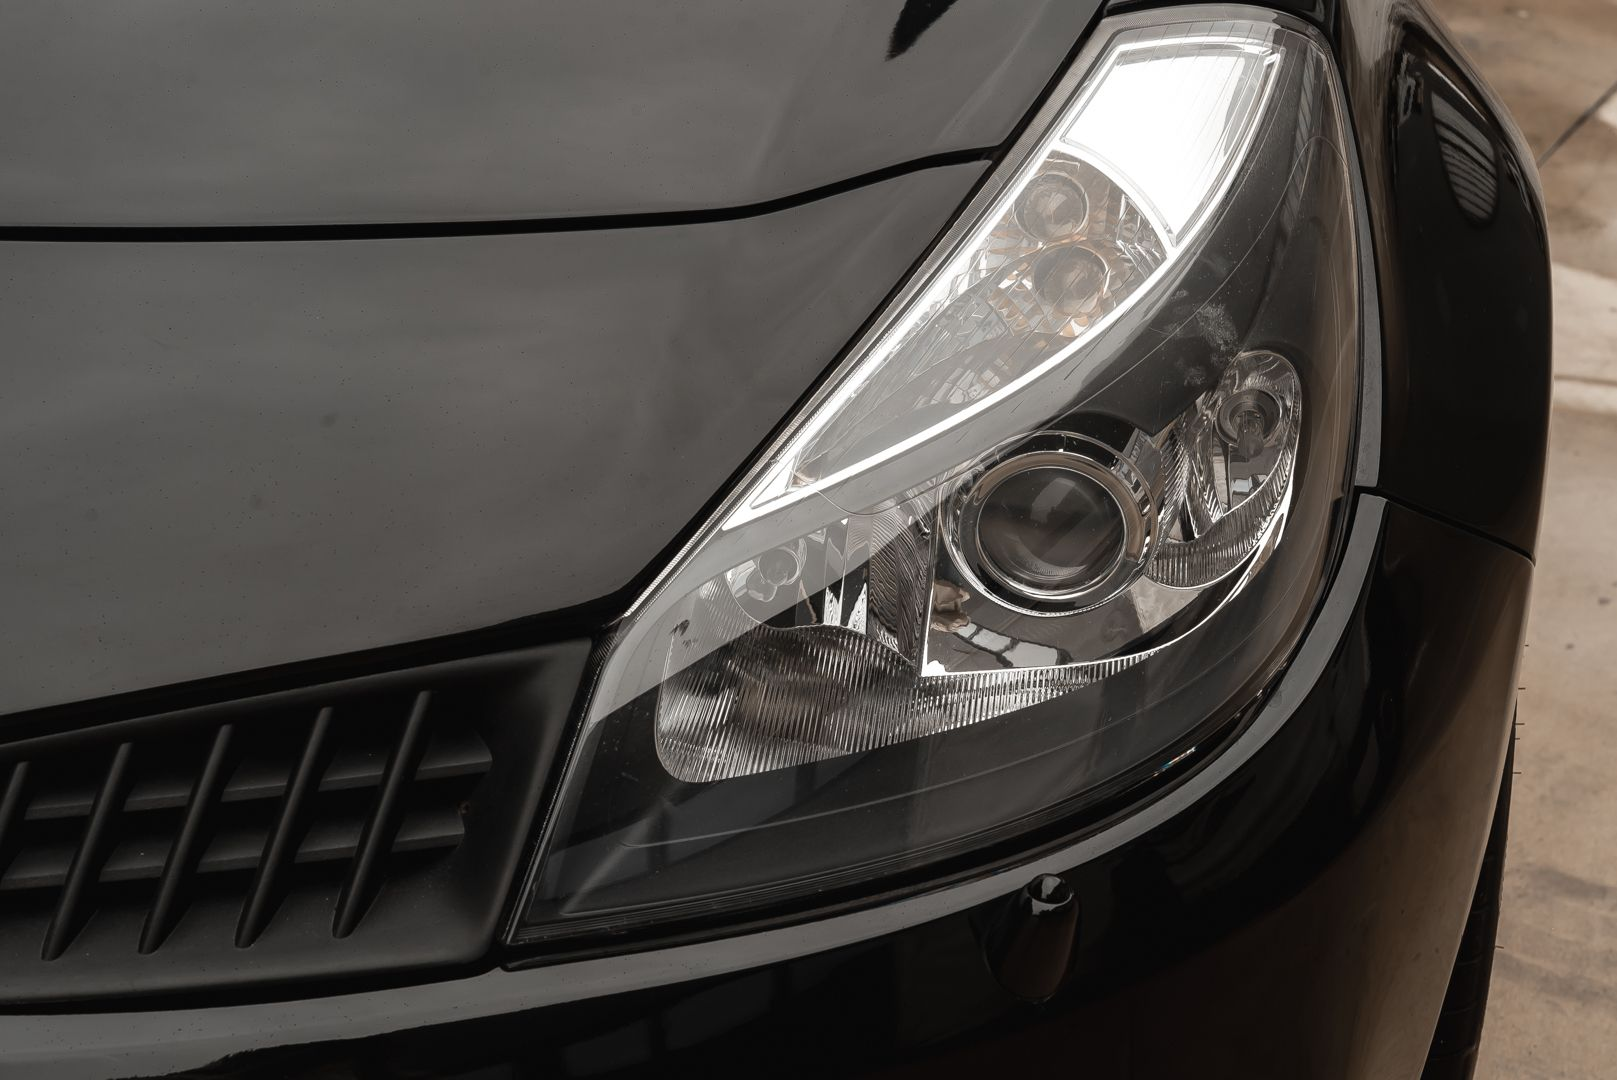 2006 Renault Clio 2.0 RS 81105